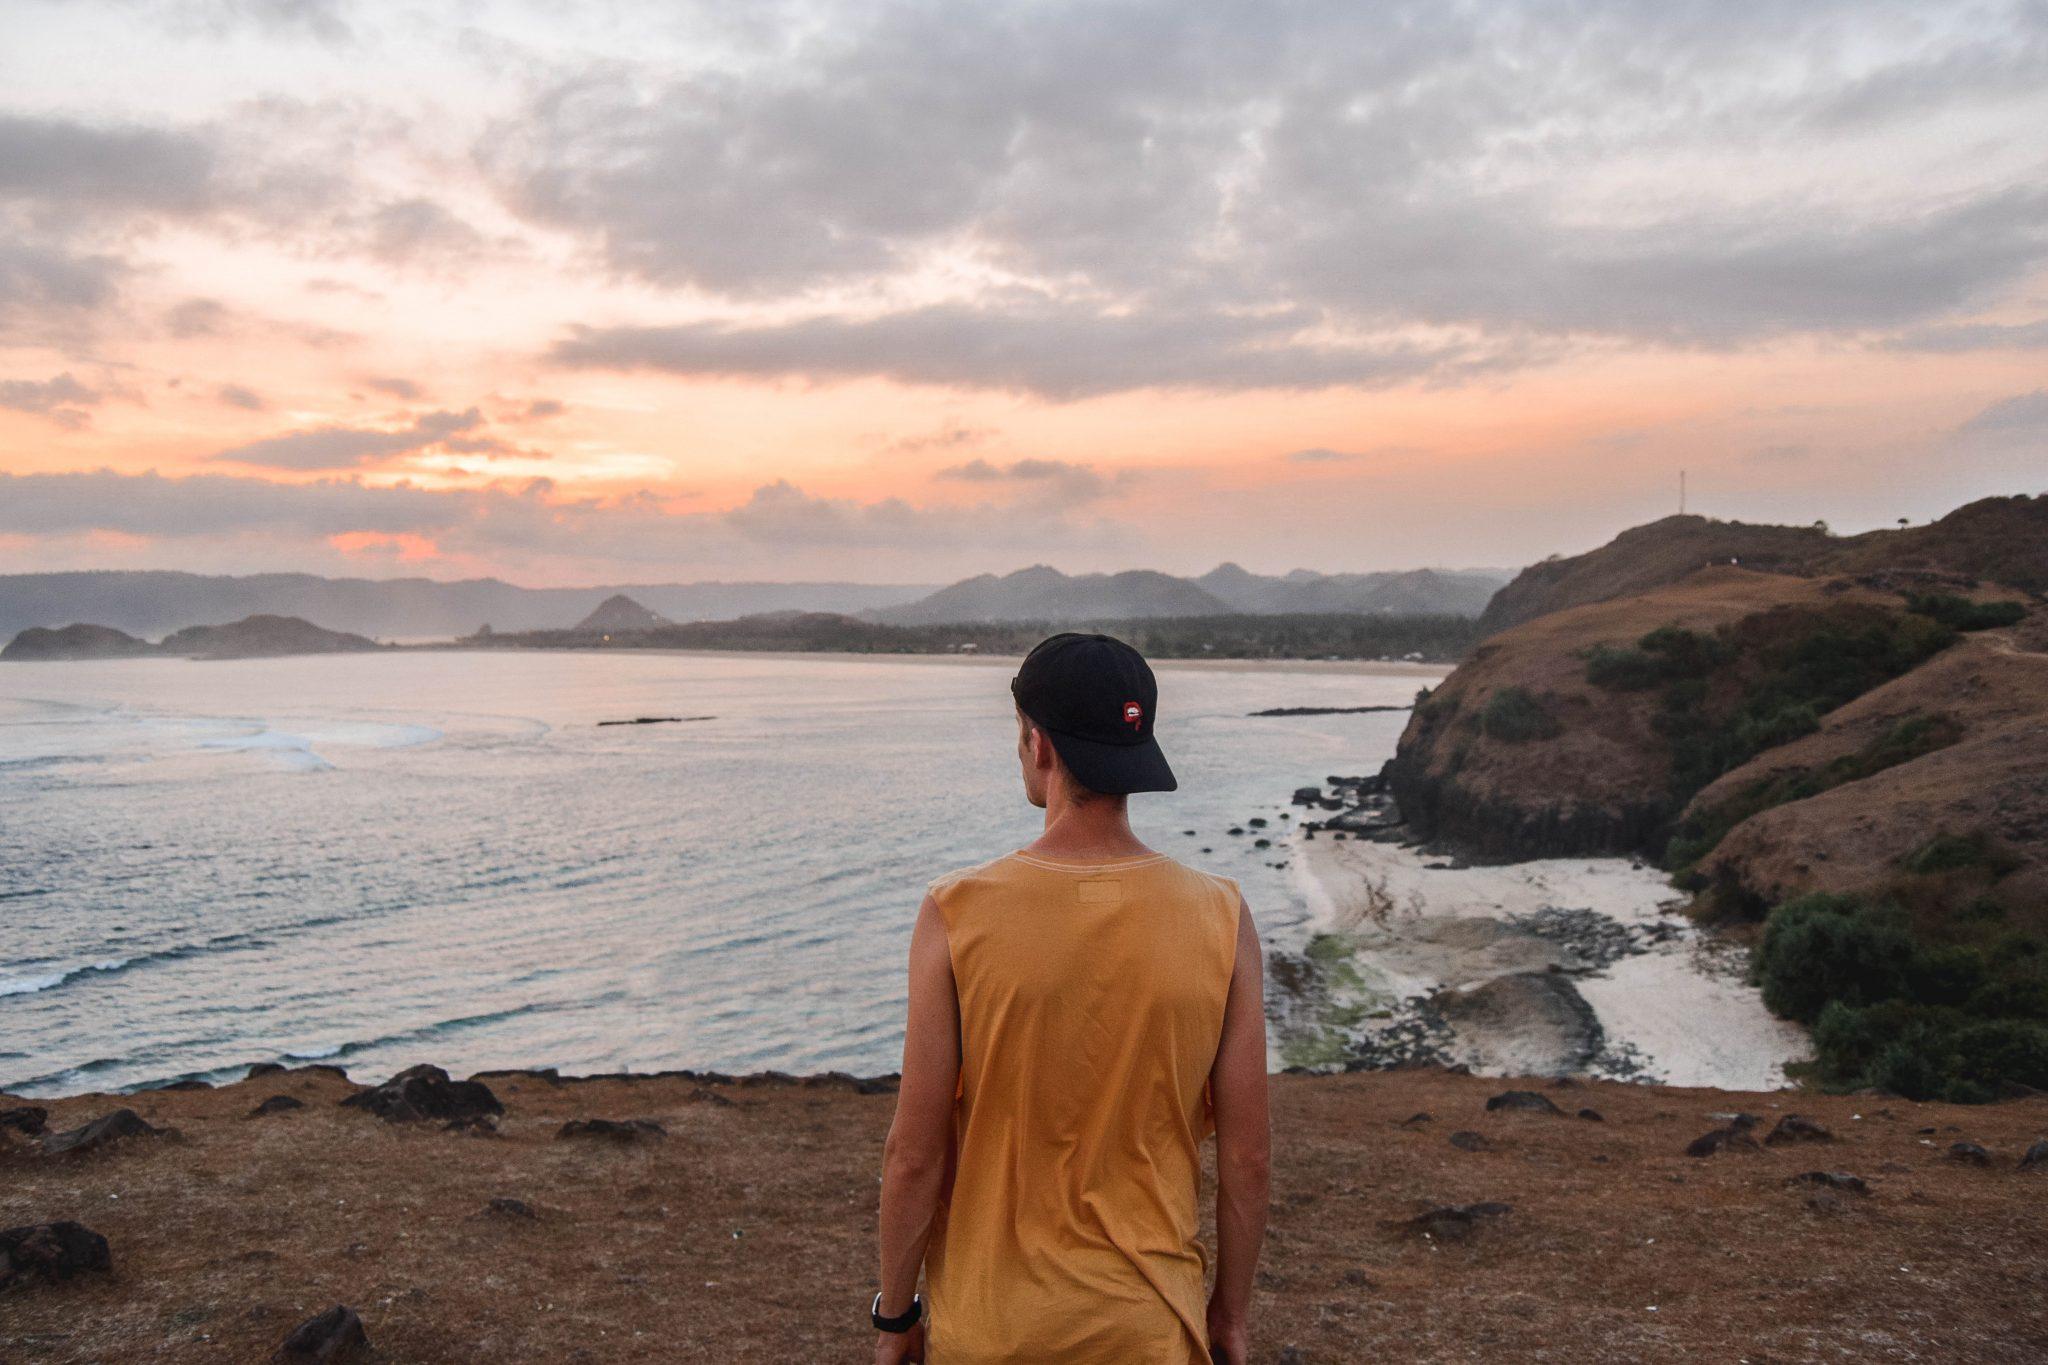 Wanderers & Warriors - Charlie & Lauren UK Travel Couple - Merese Hill Bukit Merese Lombok Sunset